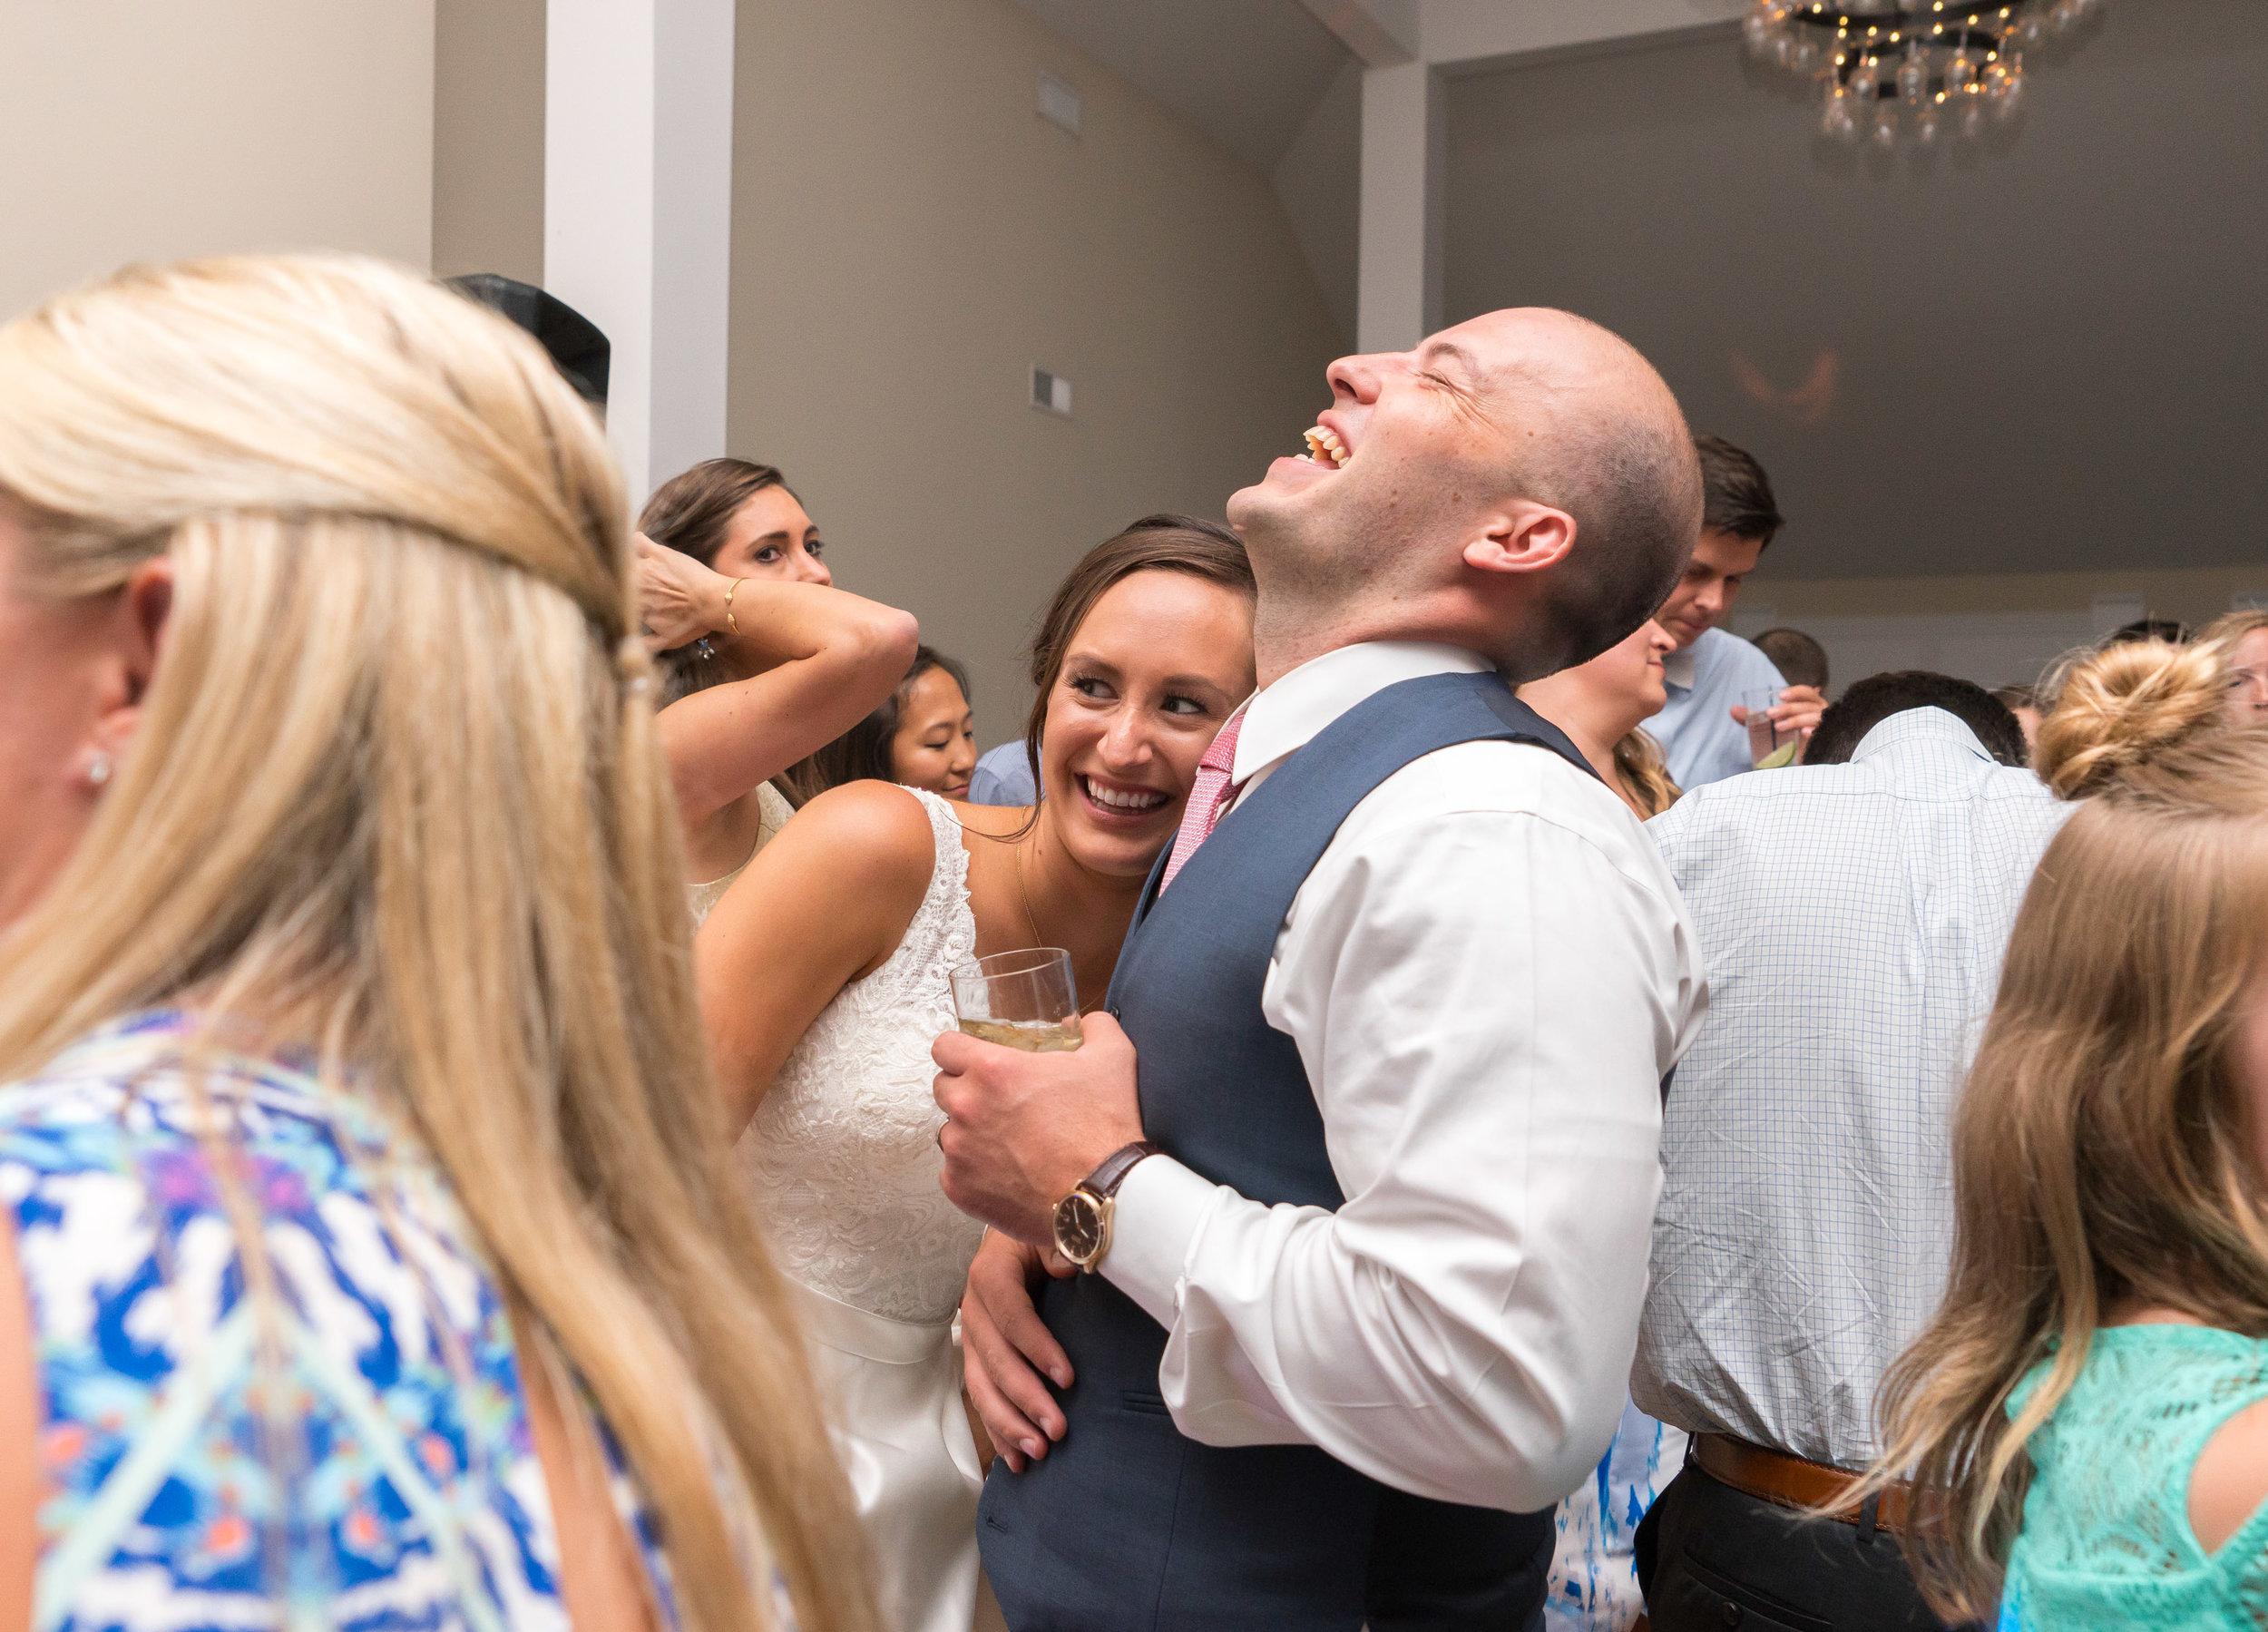 Dancing and wedding reception at Springfield Manor Winery